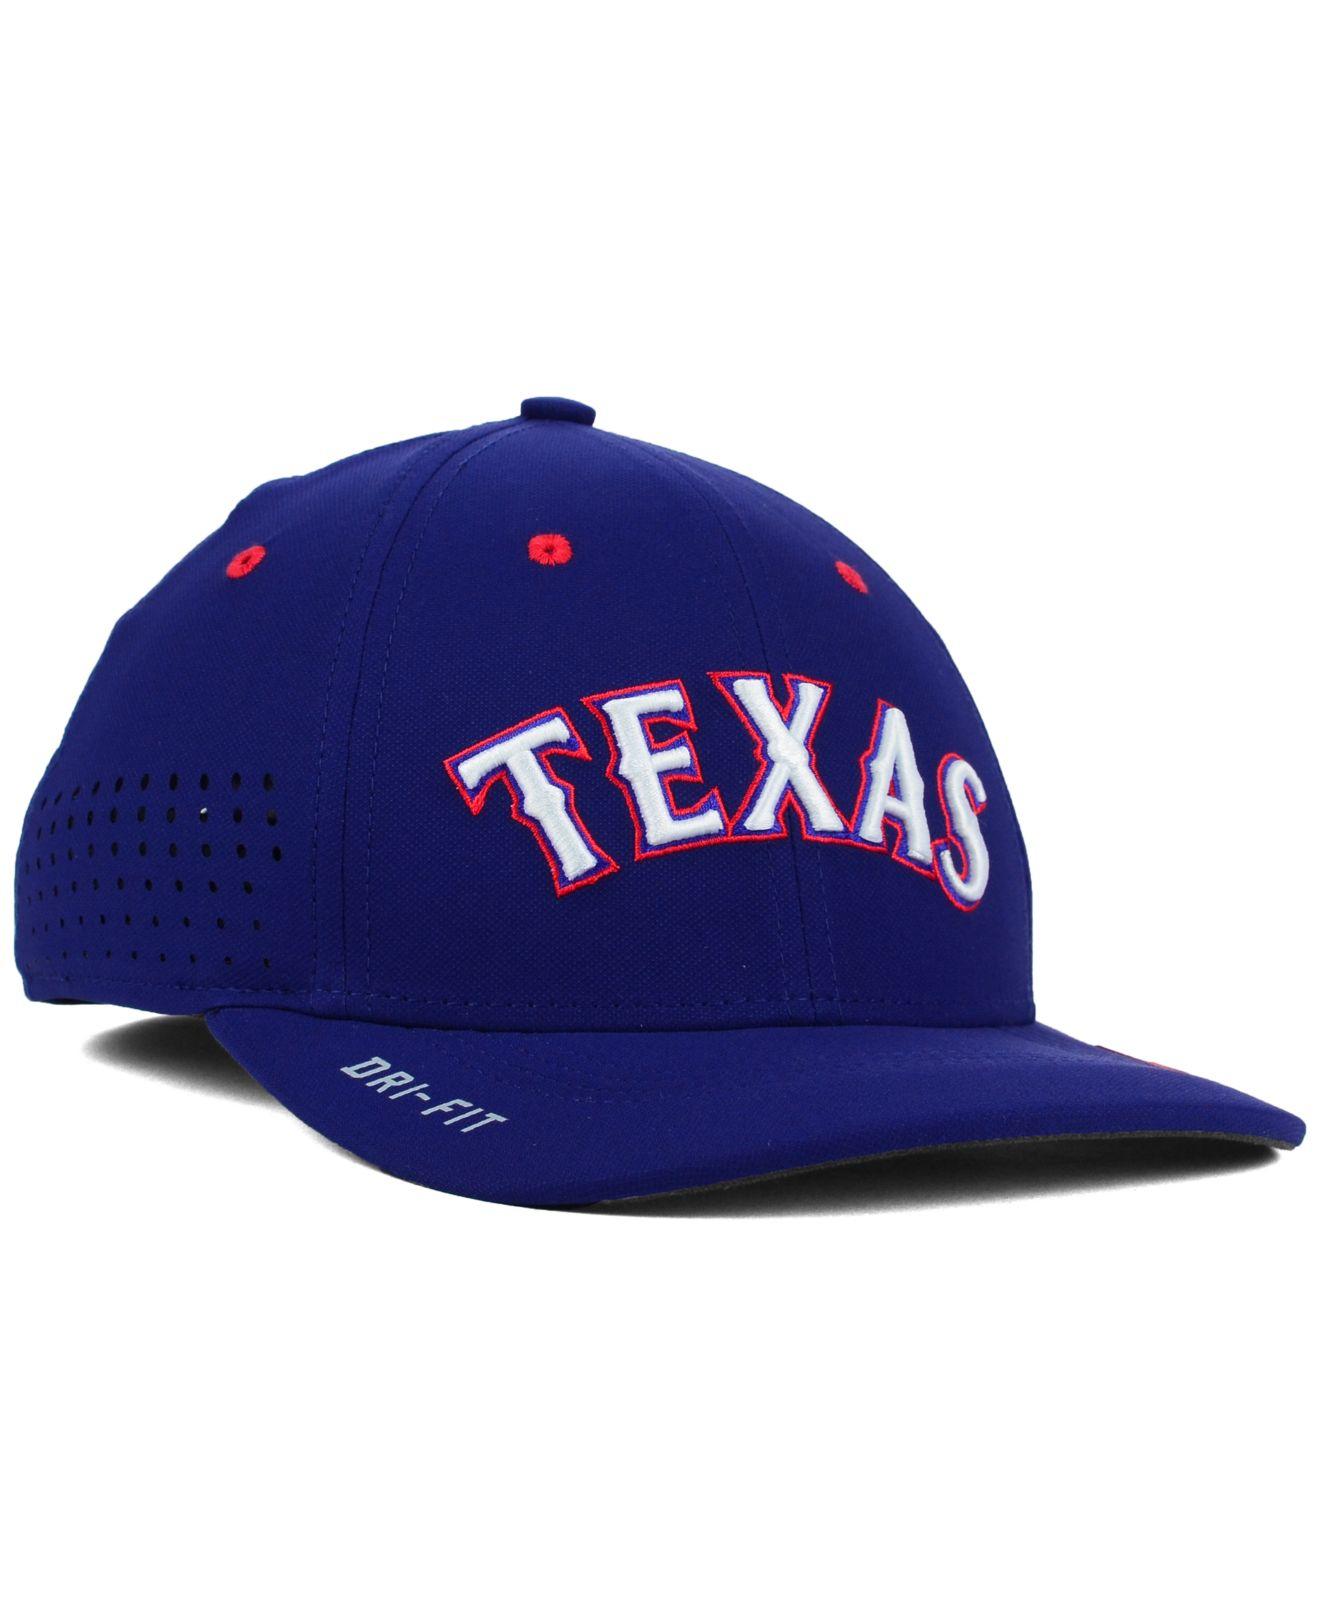 3efc2018edc spain nike adults texas rangers heritage86 dri fit mix cap 0e561 6abf0   purchase lyst nike texas rangers vapor swoosh flex cap in blue for men  255ee 22650